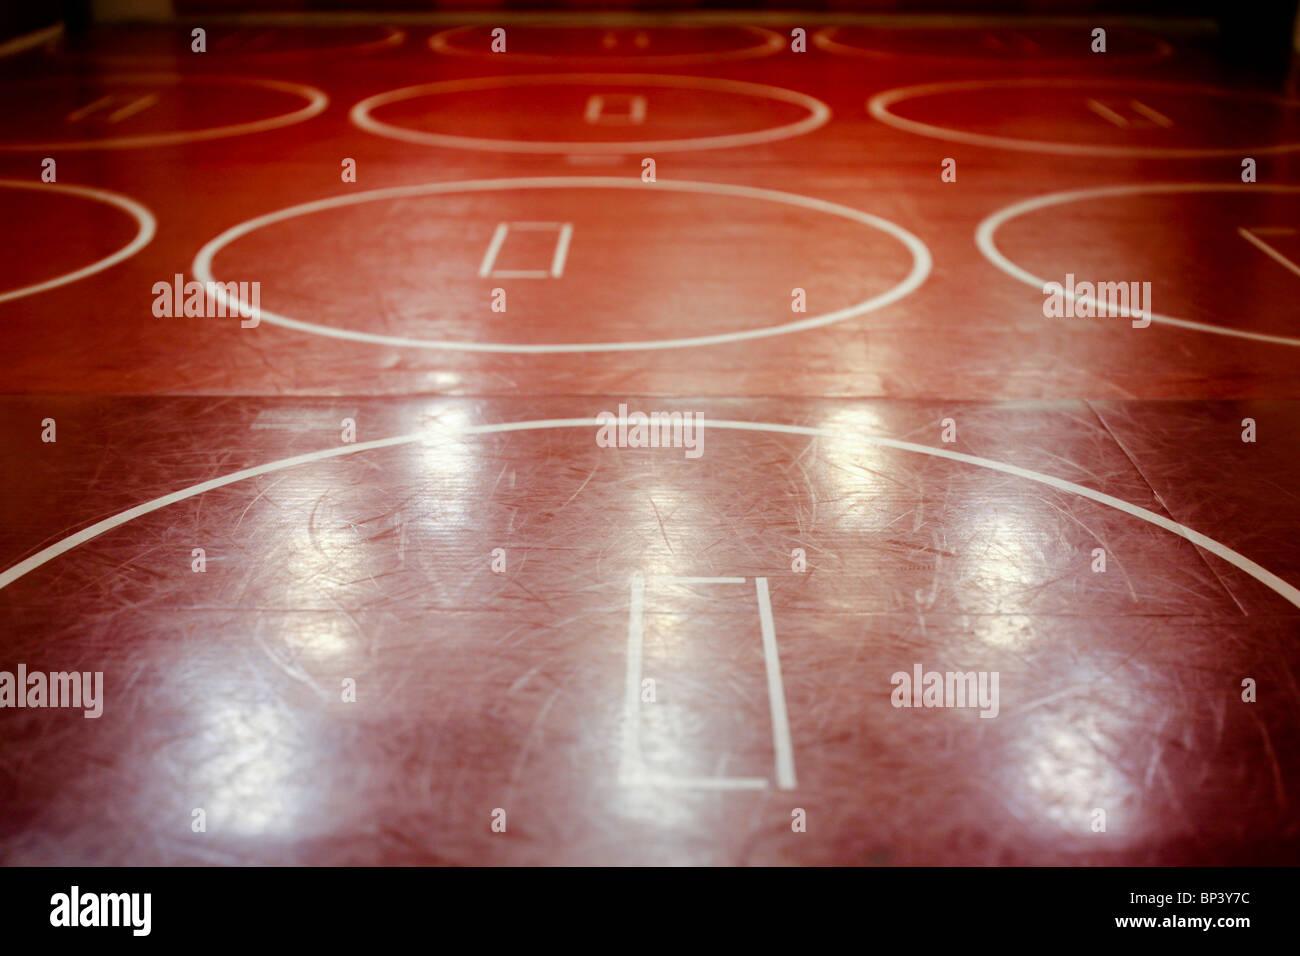 Gut getragen rote Schule Ringen Matte in ein Fitness-Studio. Stockbild